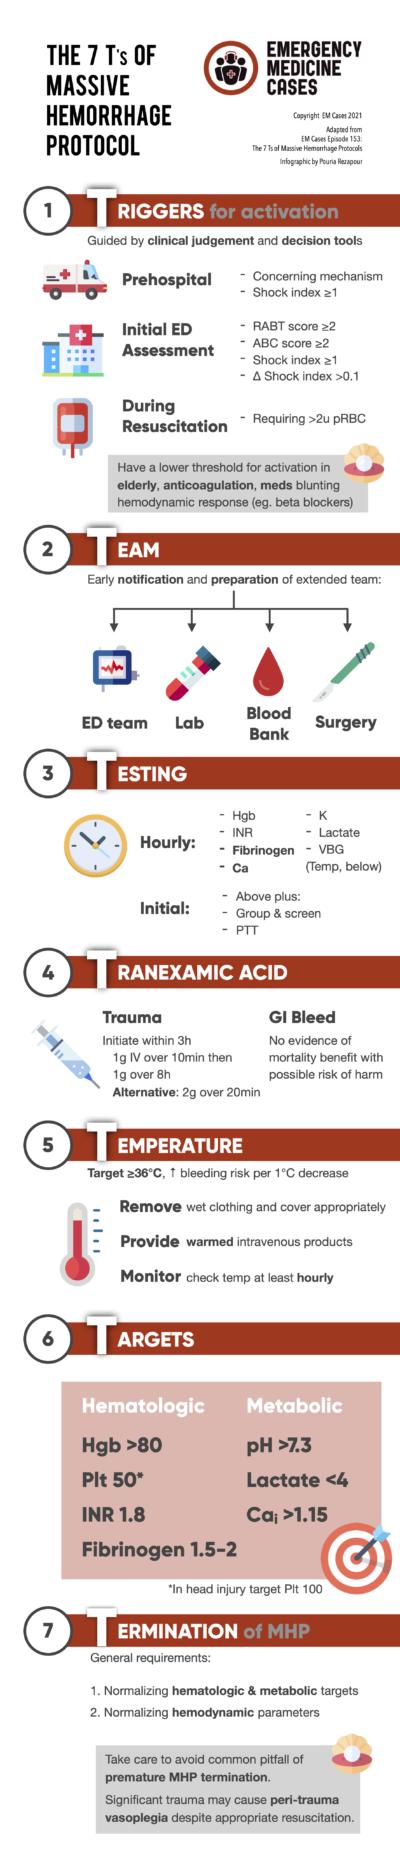 Massive Hemorrhage Protocol